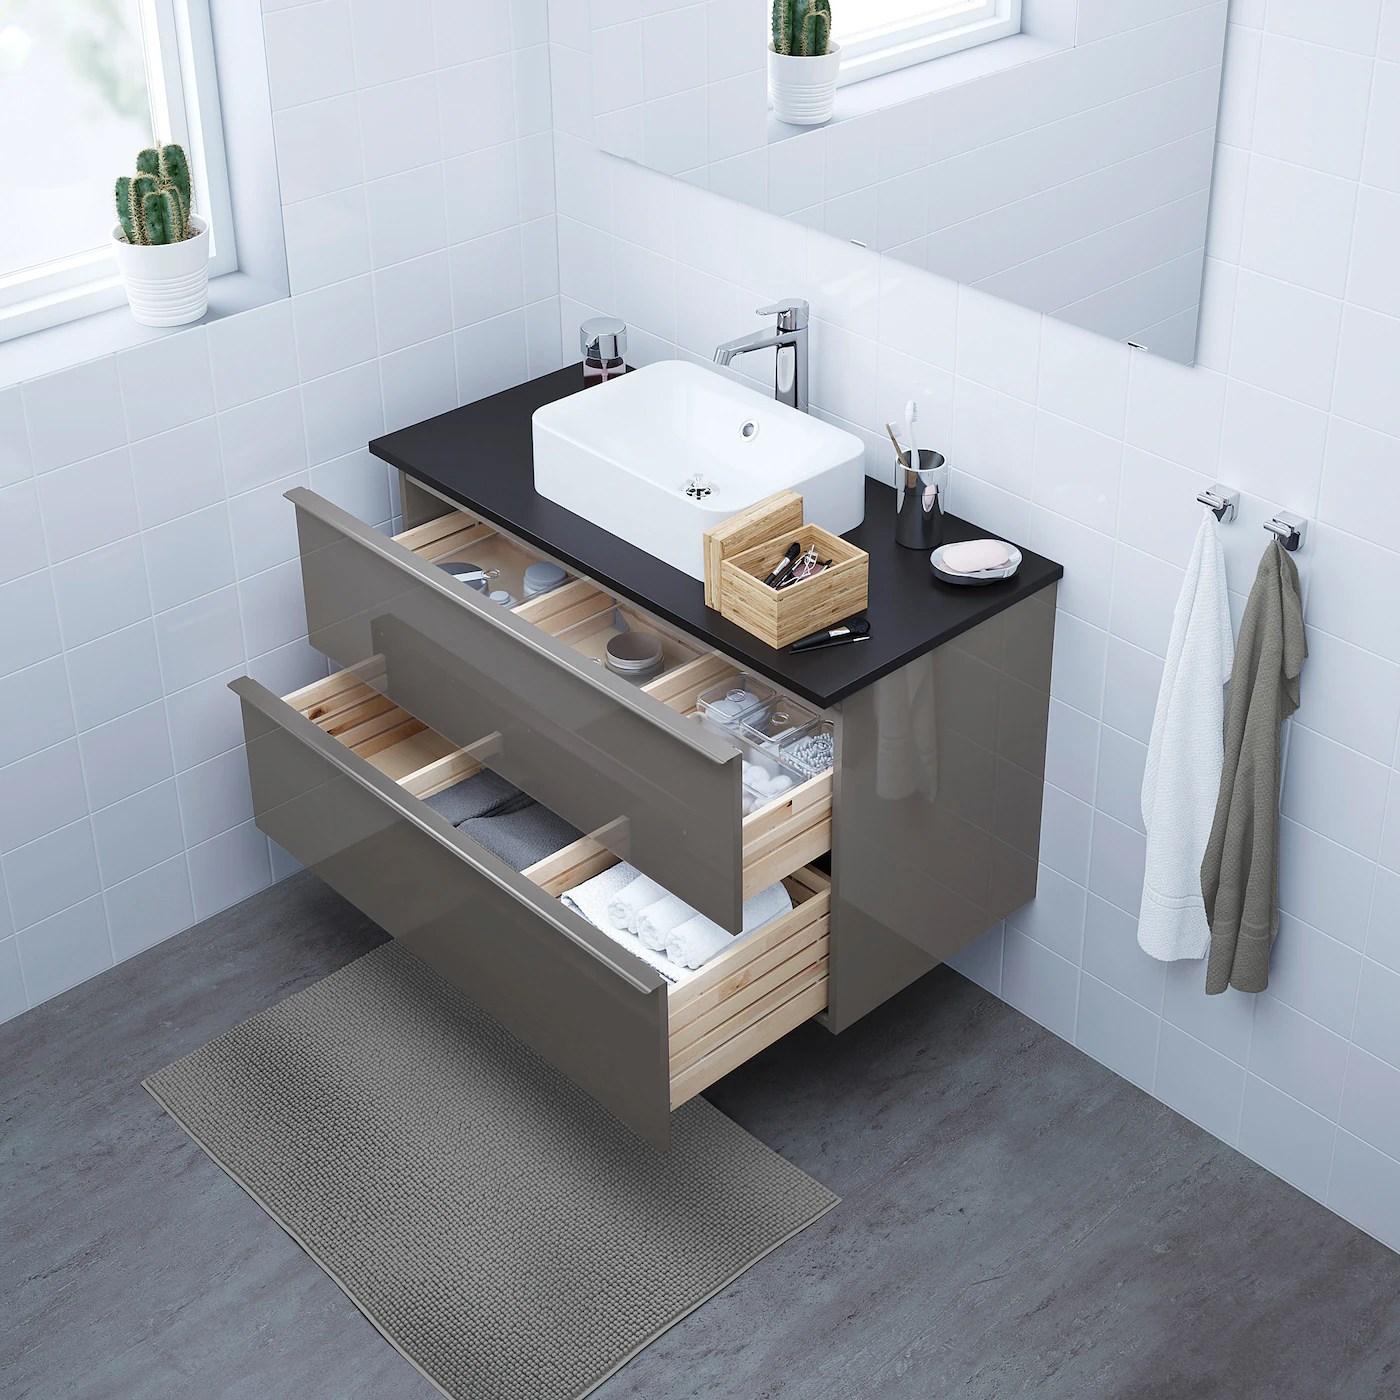 Godmorgon Meuble Lavabo 2tir Brillant Gris 100x47x58 Cm Ikea